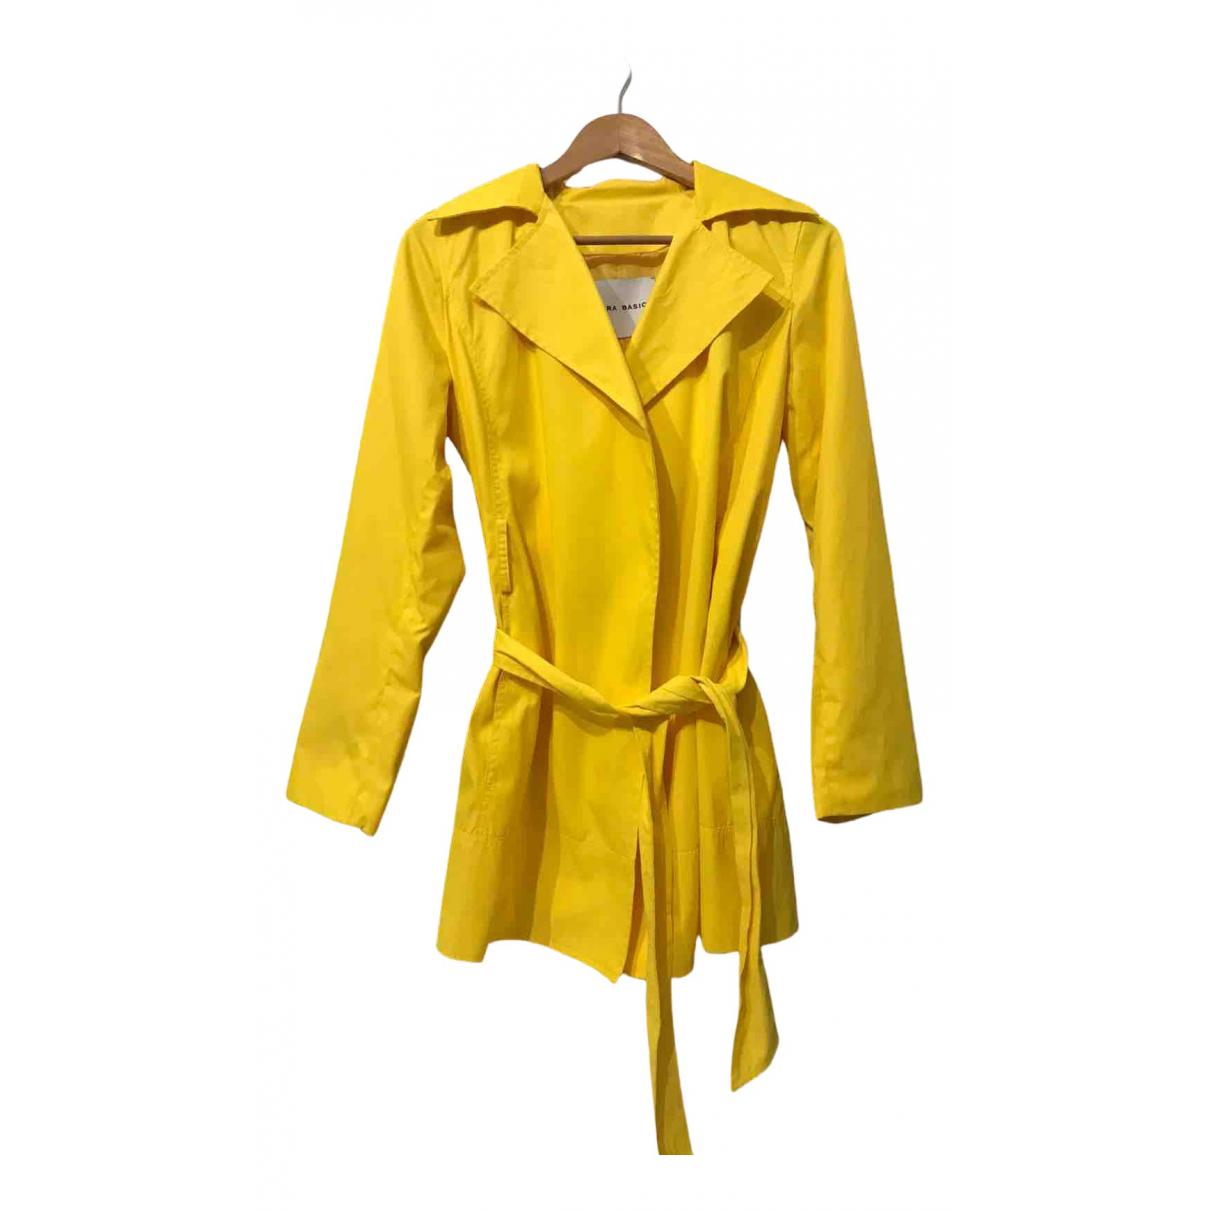 Zara N Yellow Cotton Trench coat for Women M International